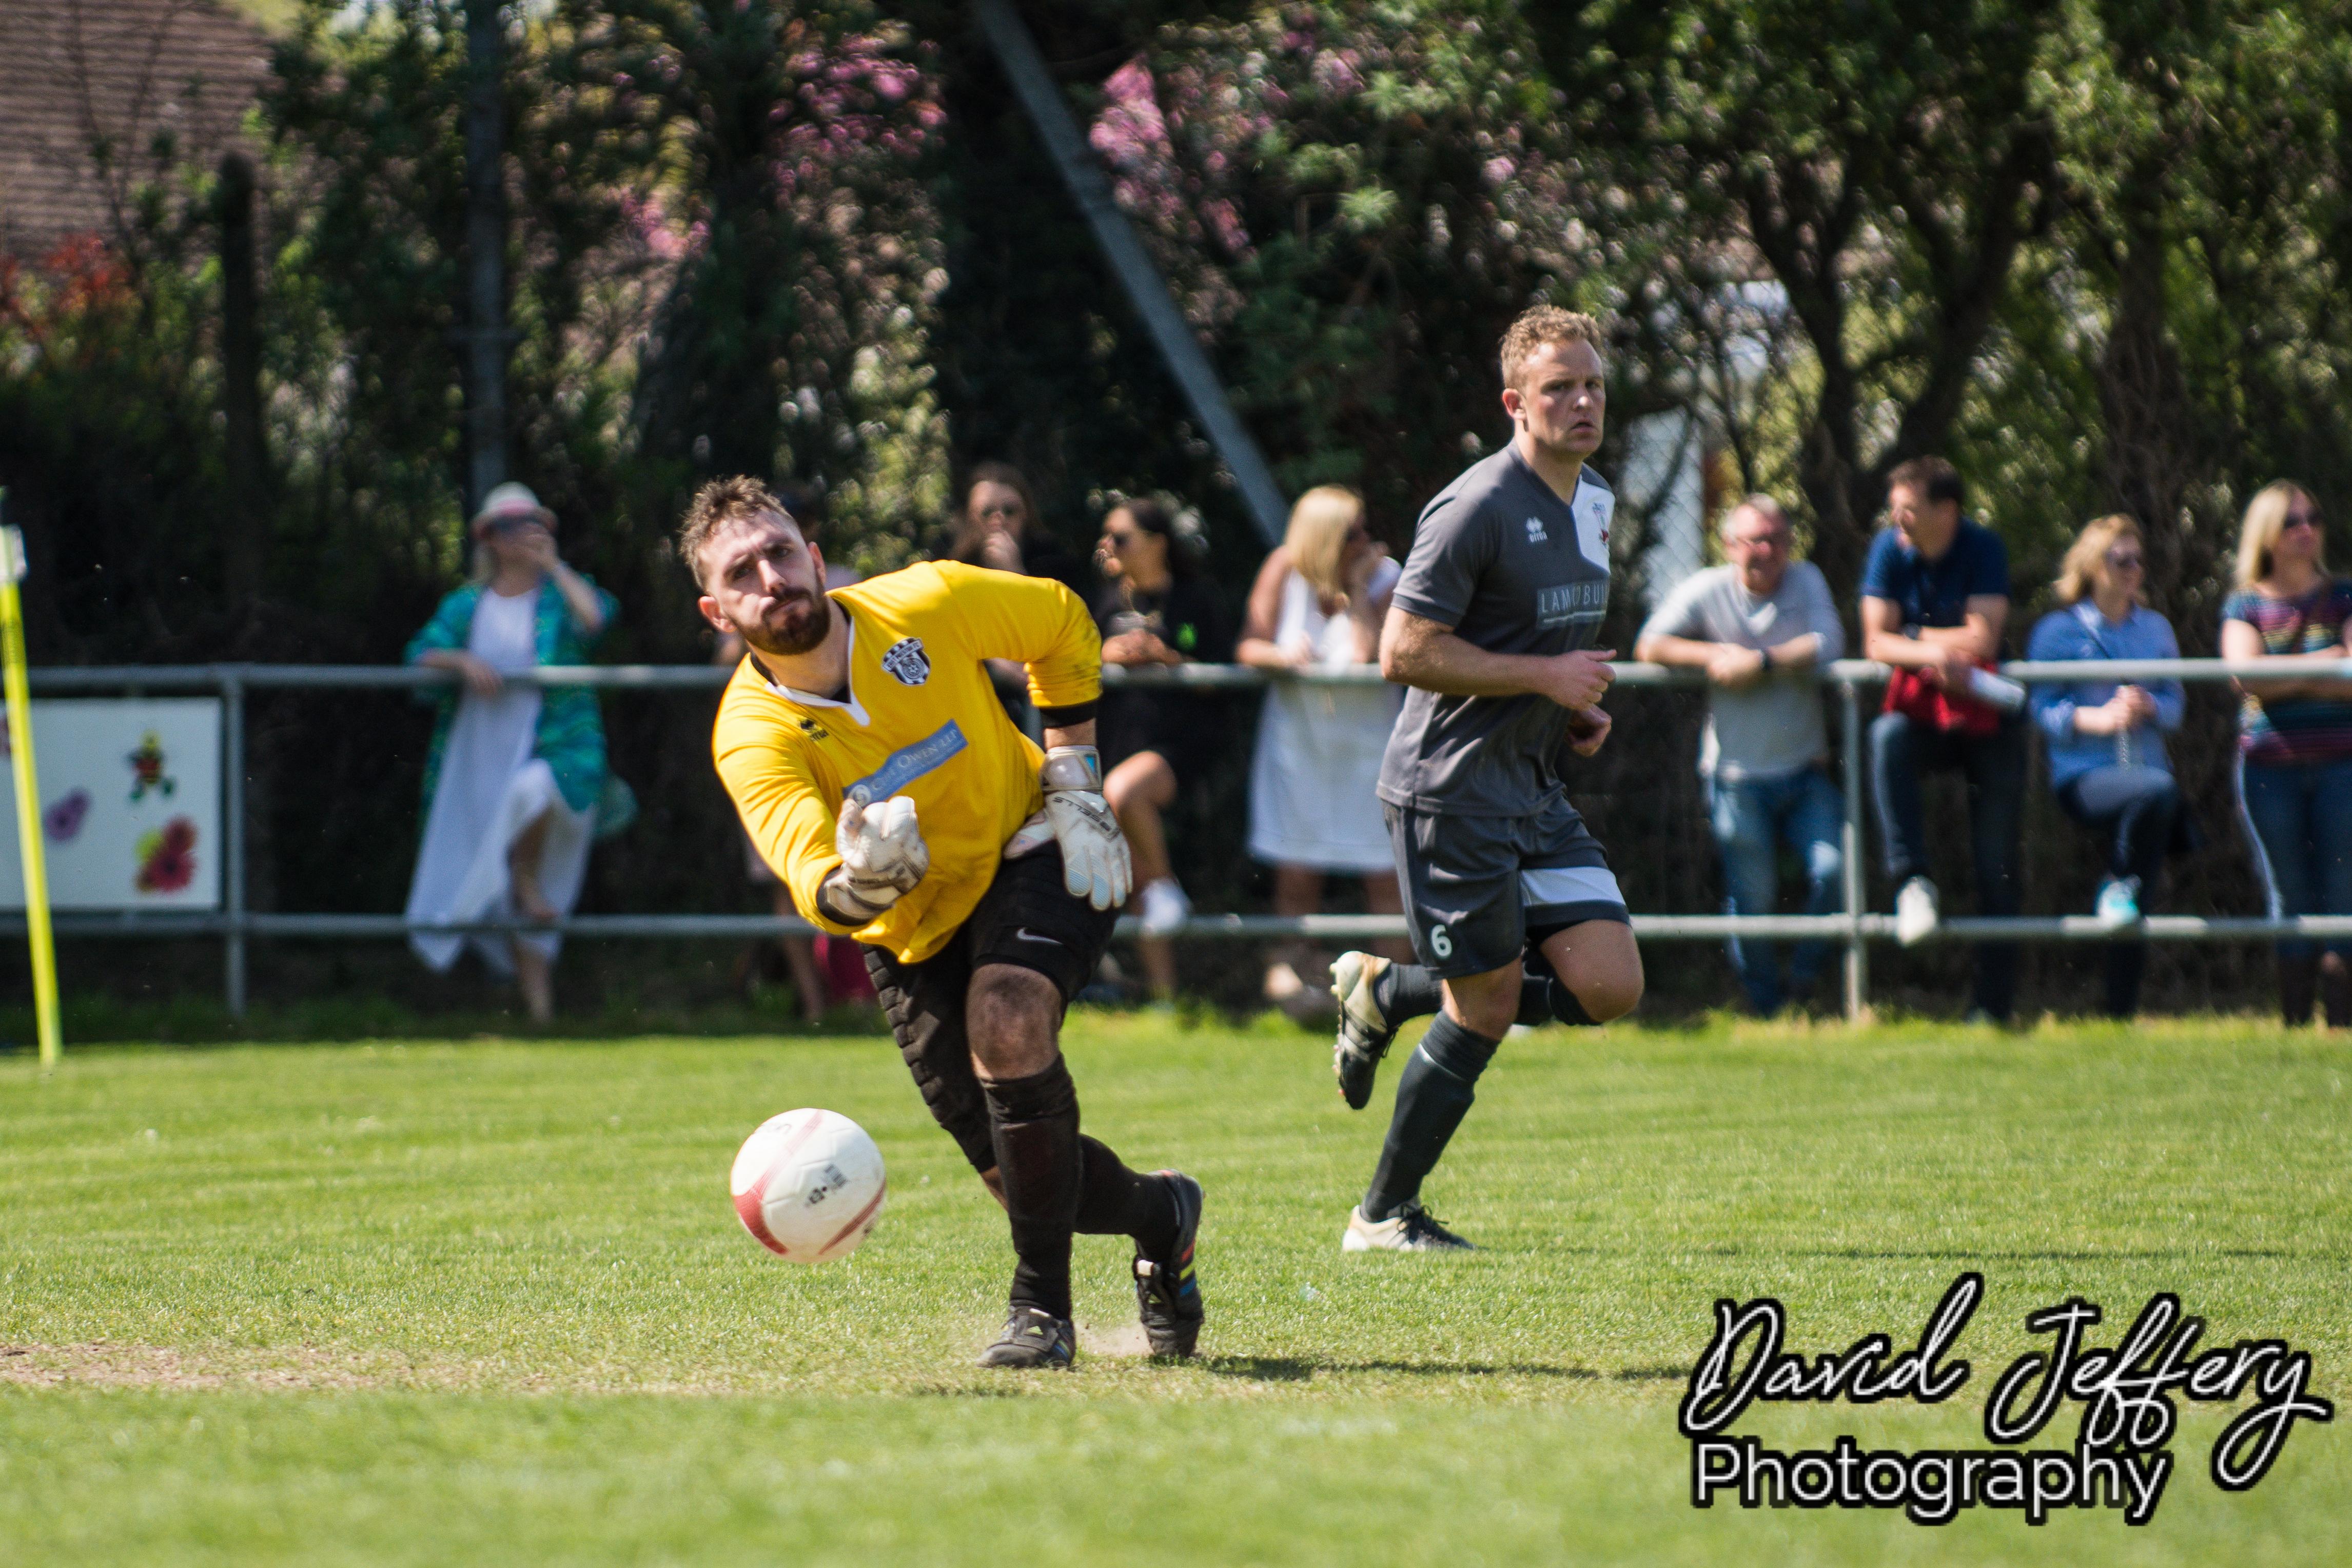 070 Steyn vs Wick, Div1 Cup Final DAVID_